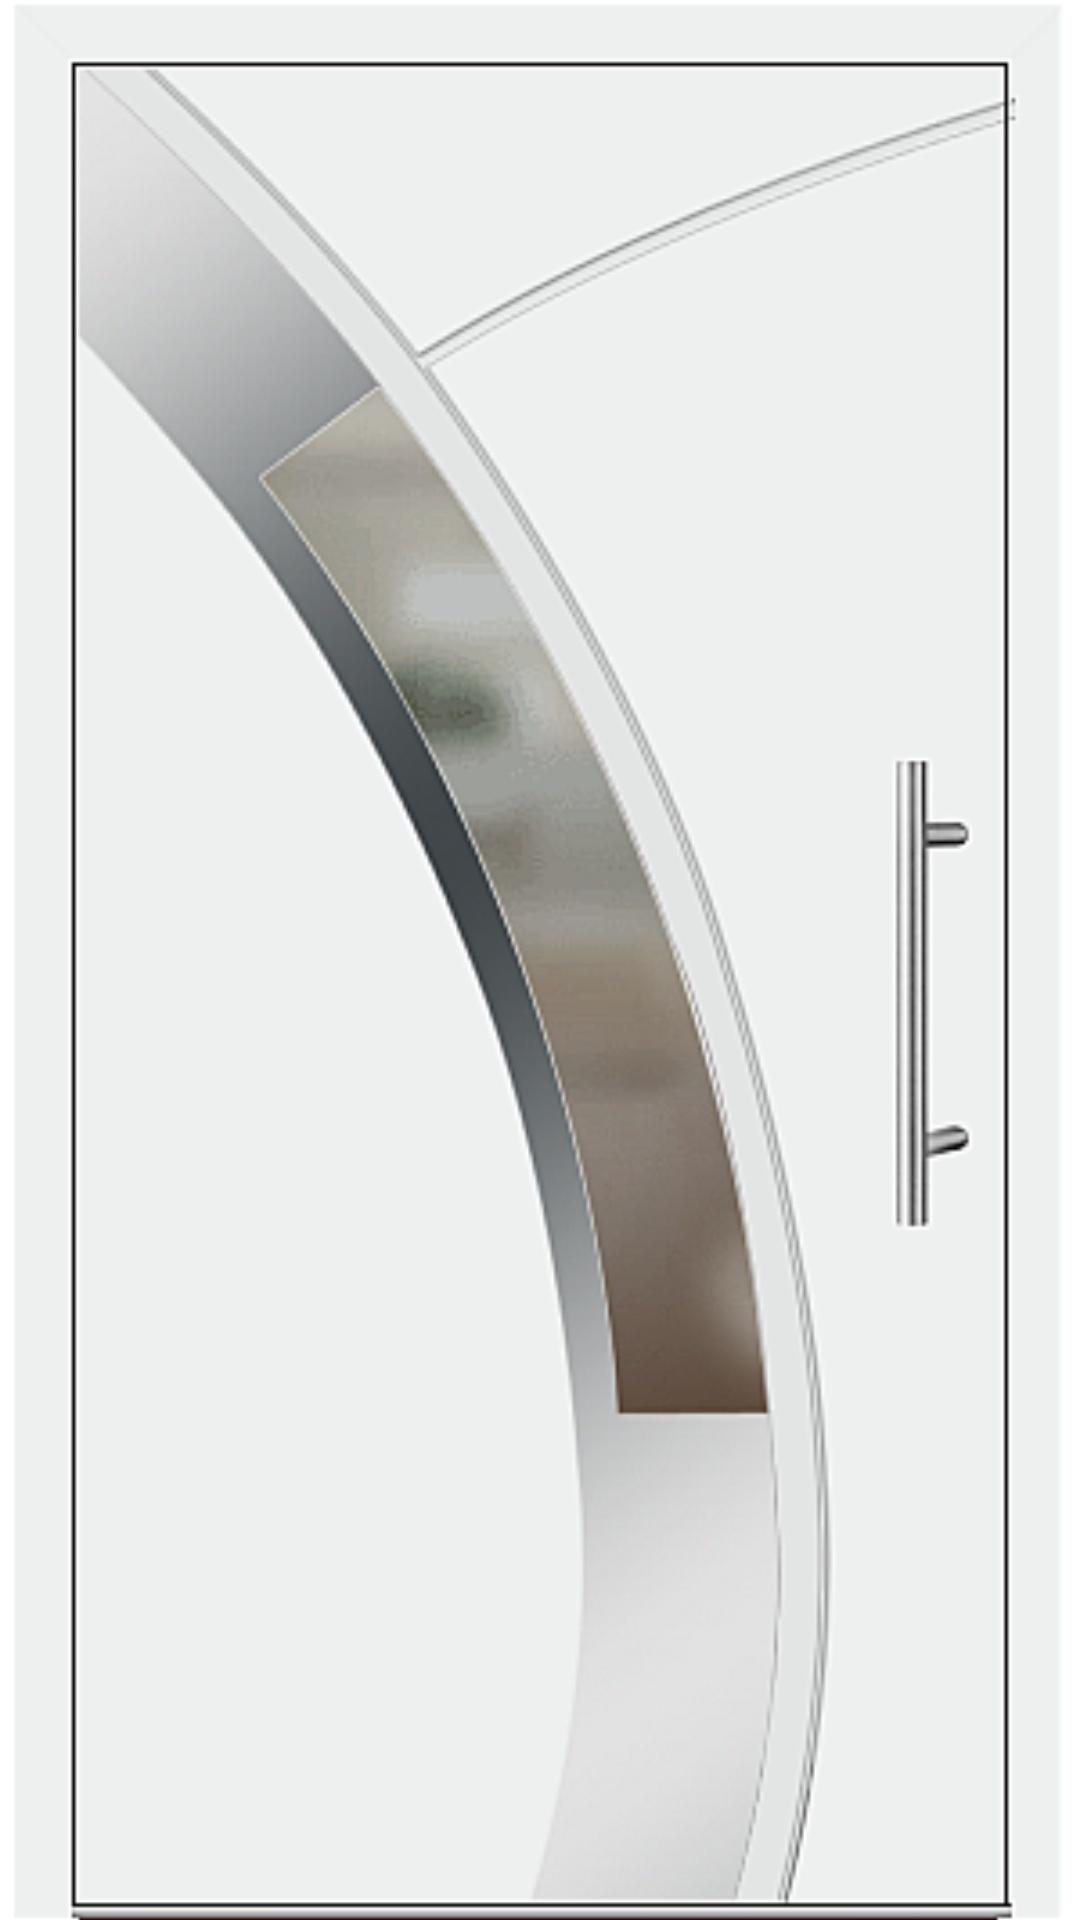 Aluminium Haustür Modell 6438-57 weiß